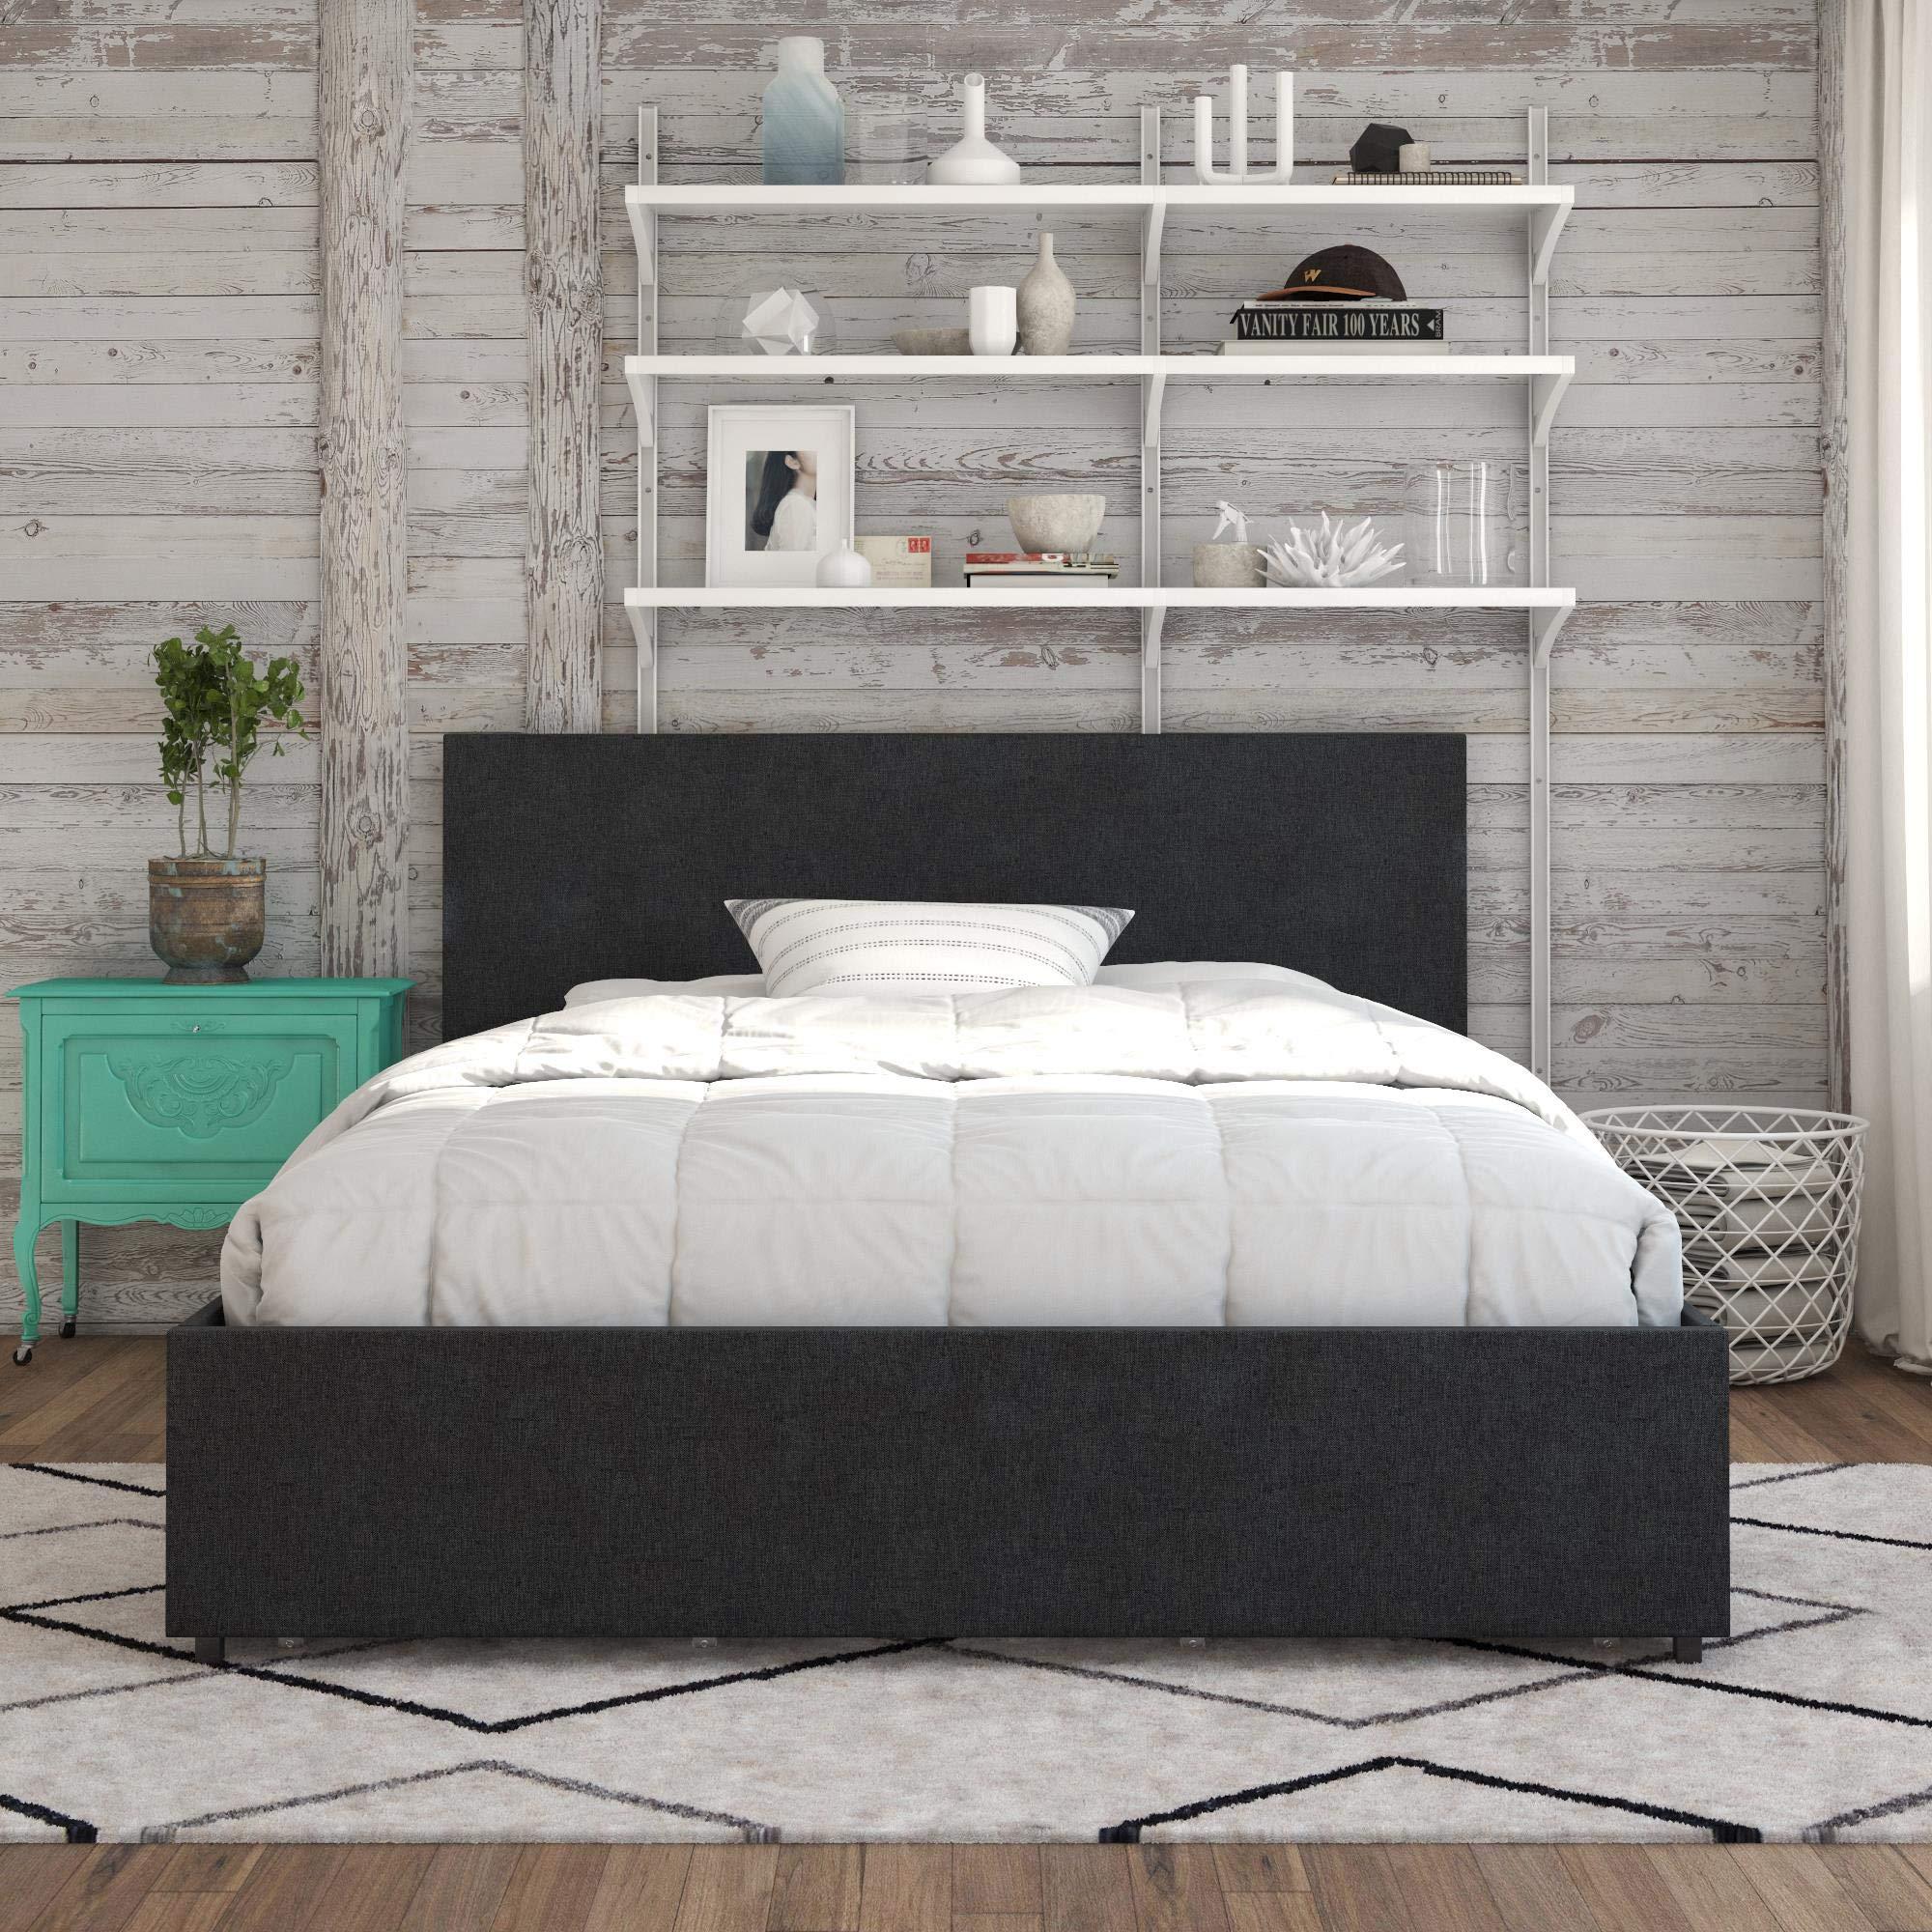 Novogratz Kelly Bed with Storage, Queen, Dark Gray Linen by Novogratz (Image #3)